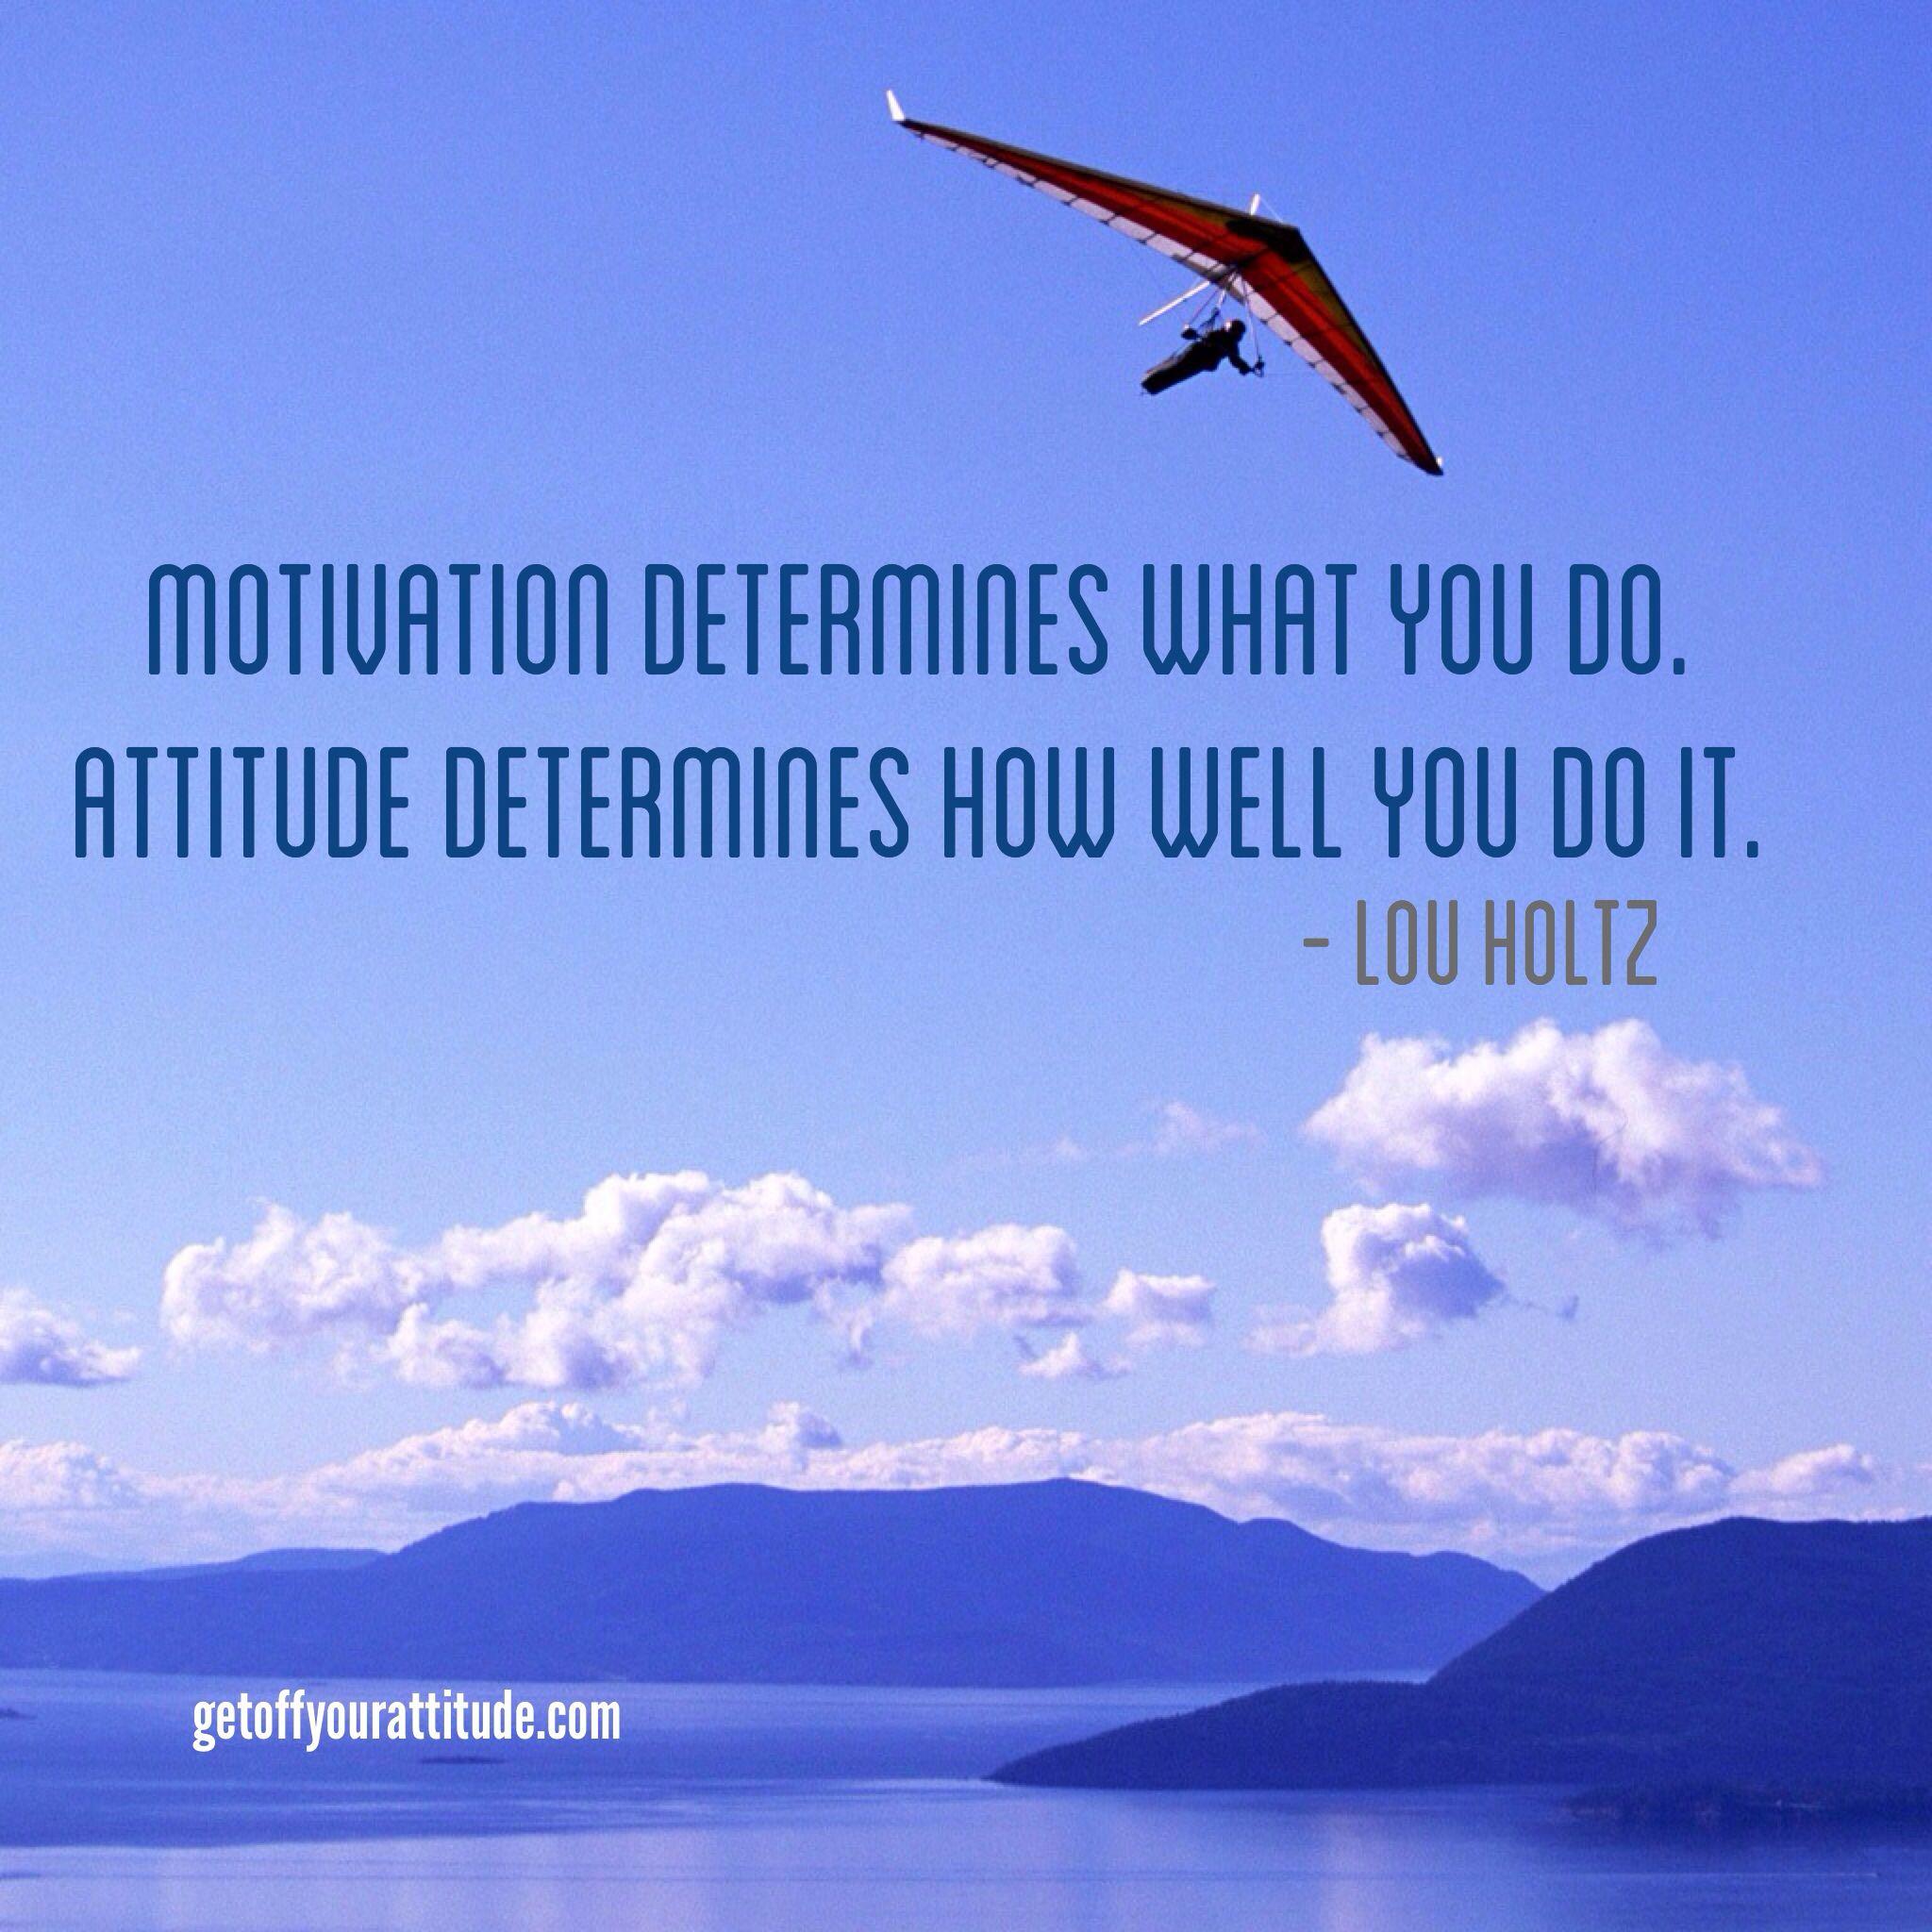 Positive Attitude Poster.            getoffyourattitude.com